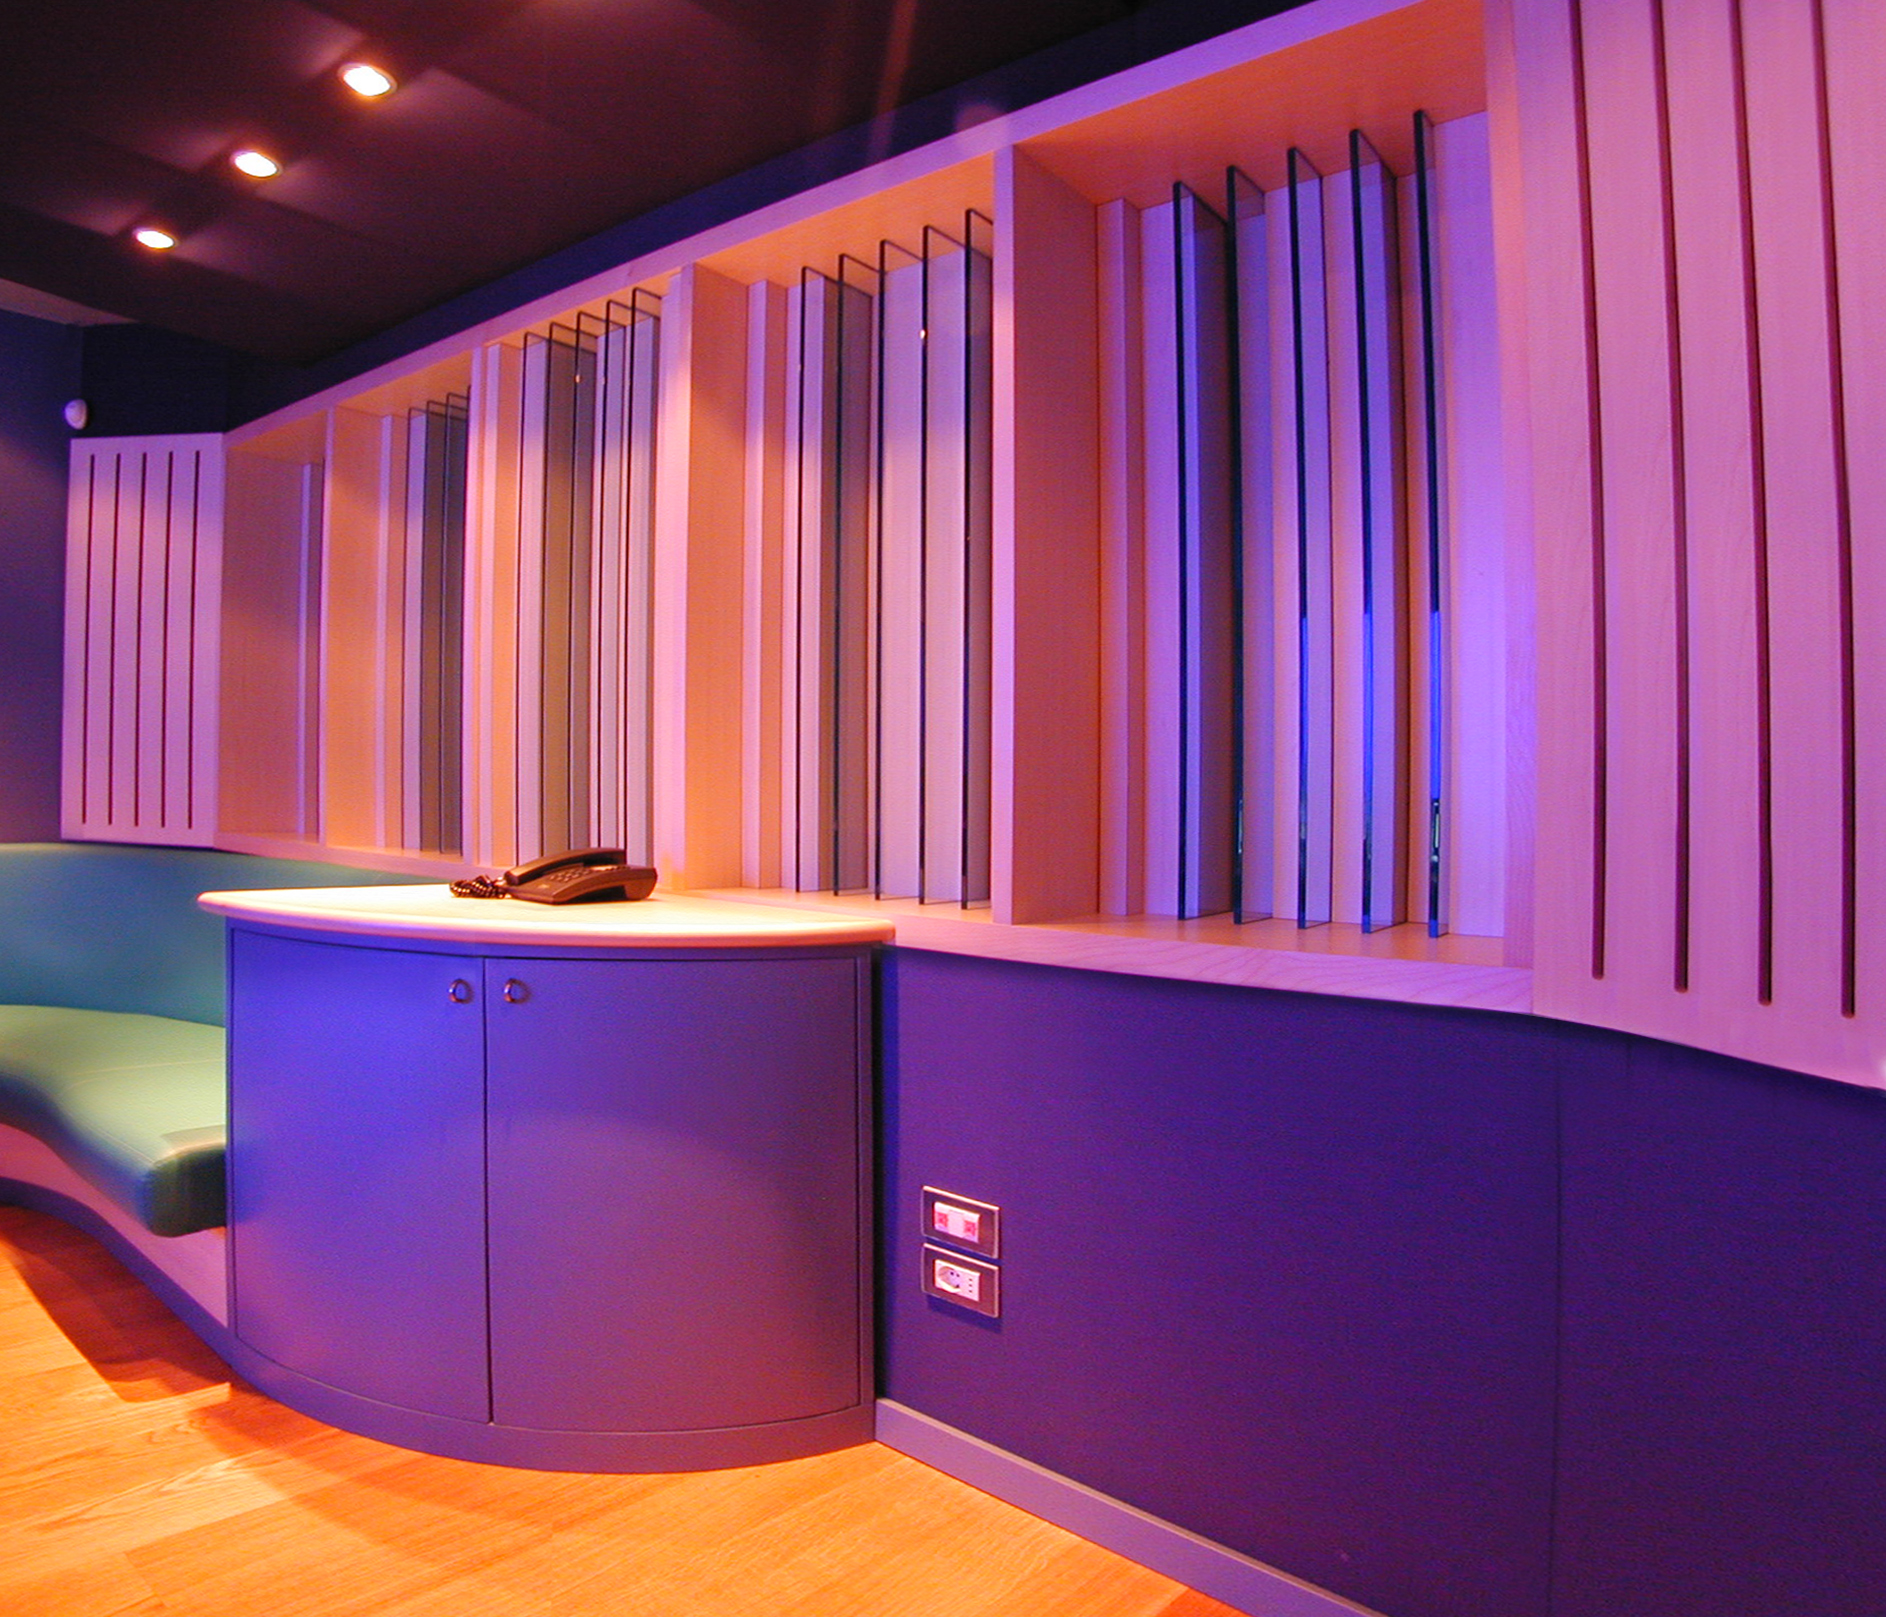 23HB Studio 3 Rear